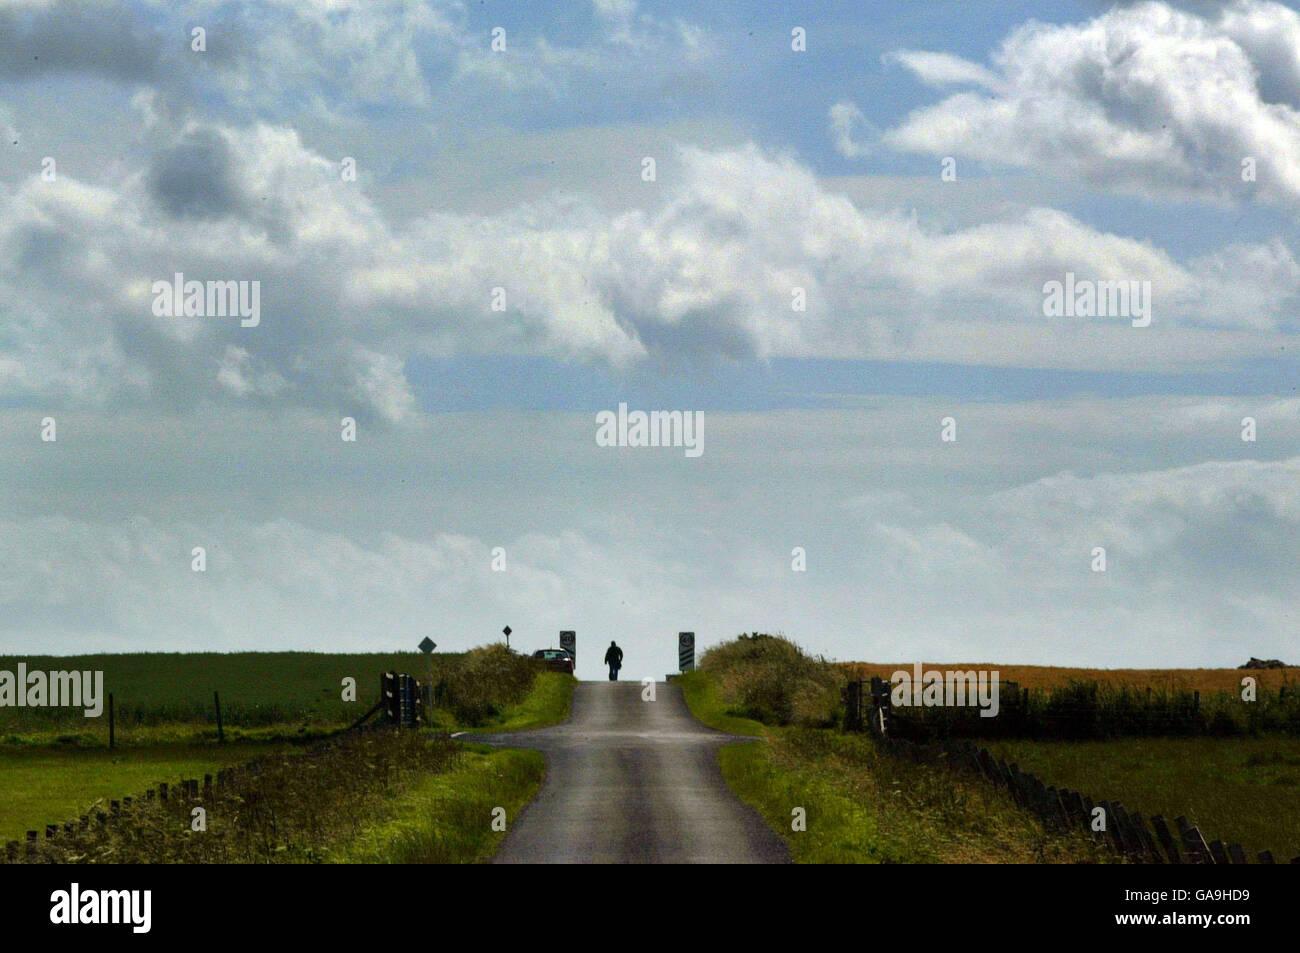 Caithness - Scotland - Stock Image